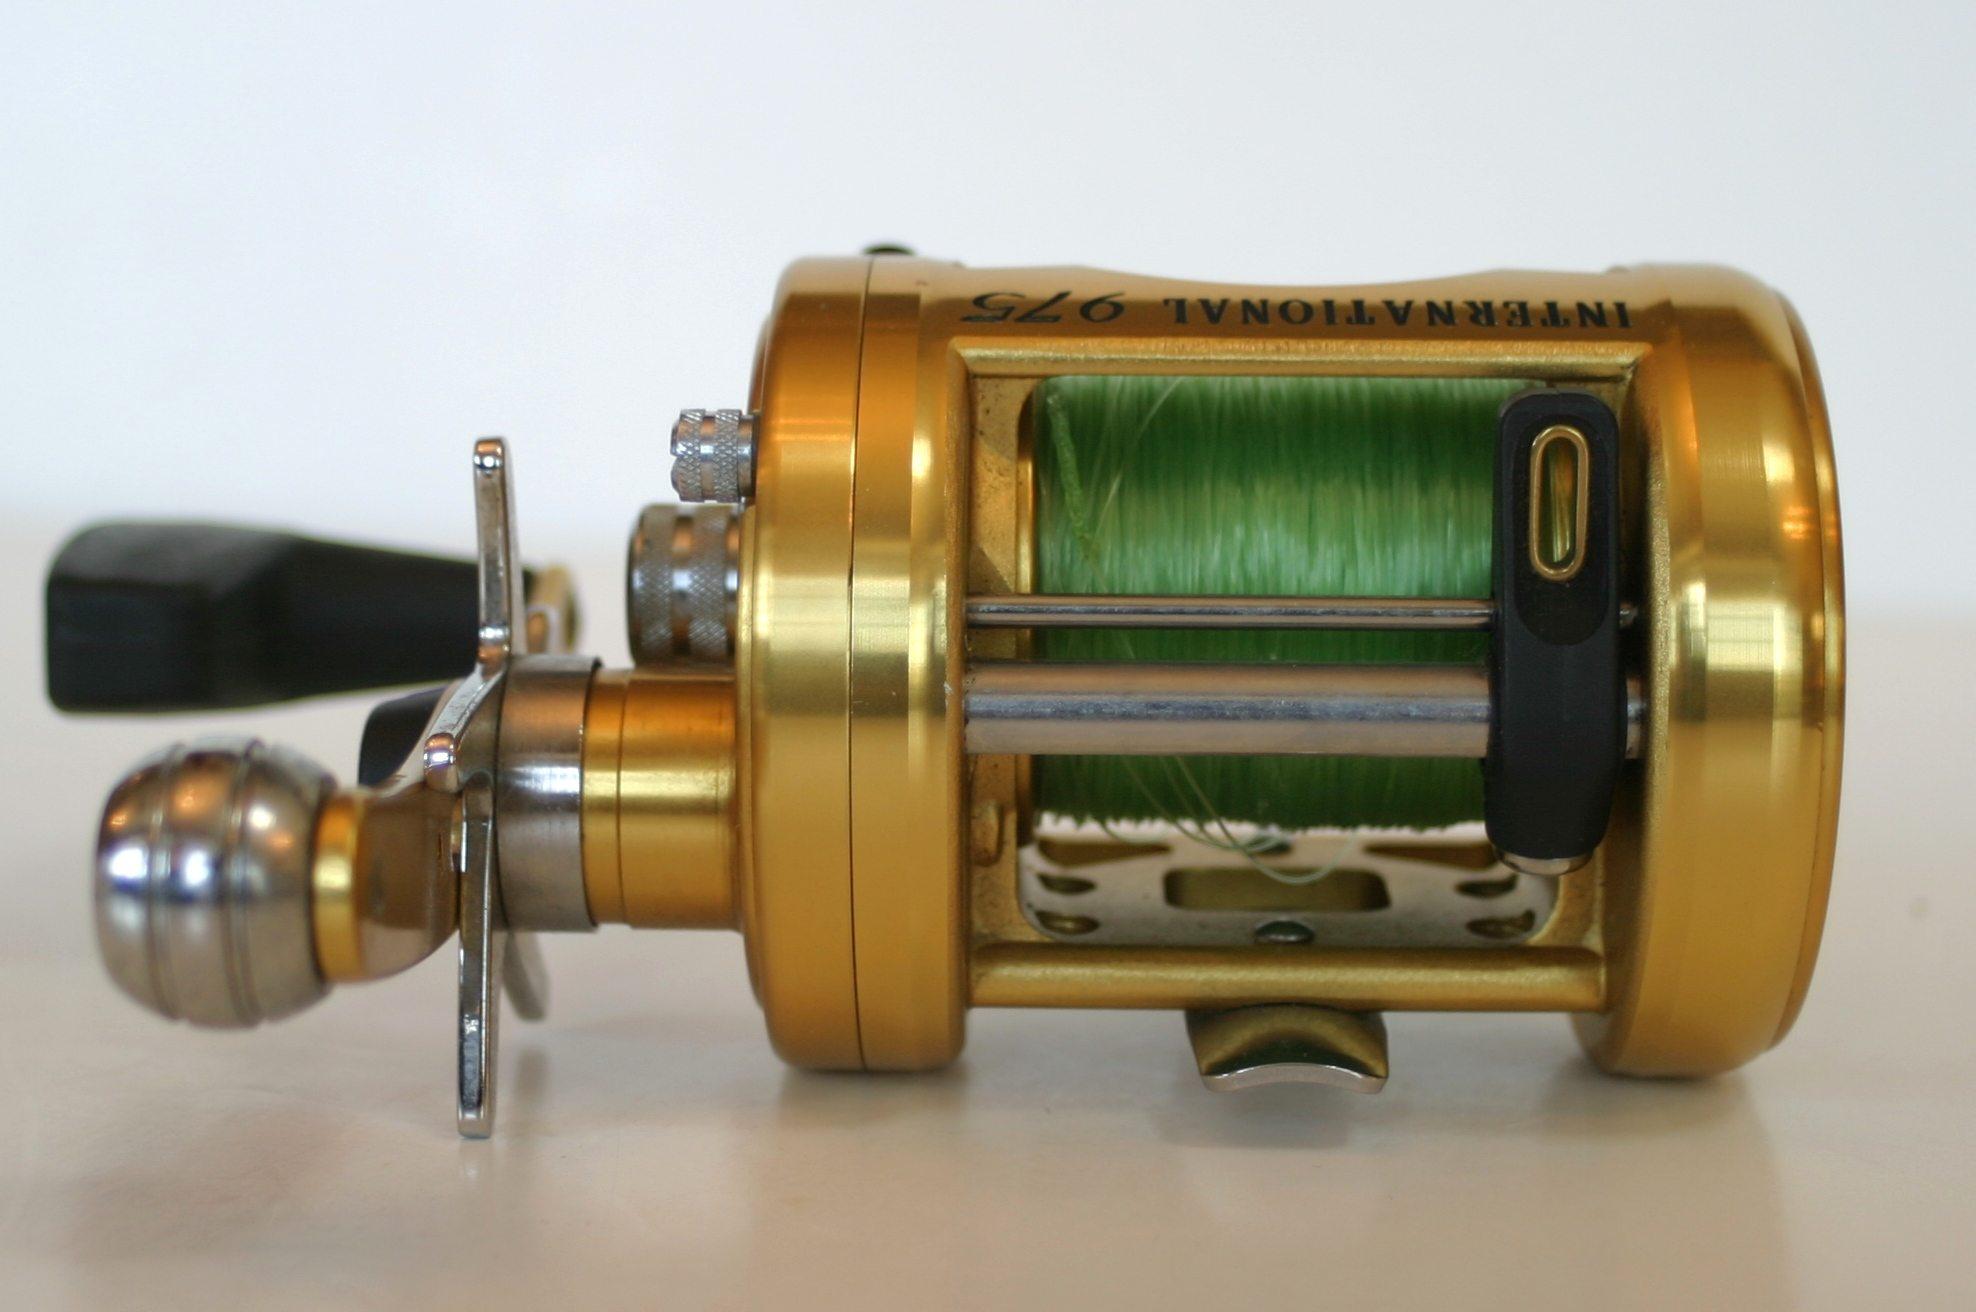 Penn reels international 975 bait caster fishing reel made for American made fishing reels